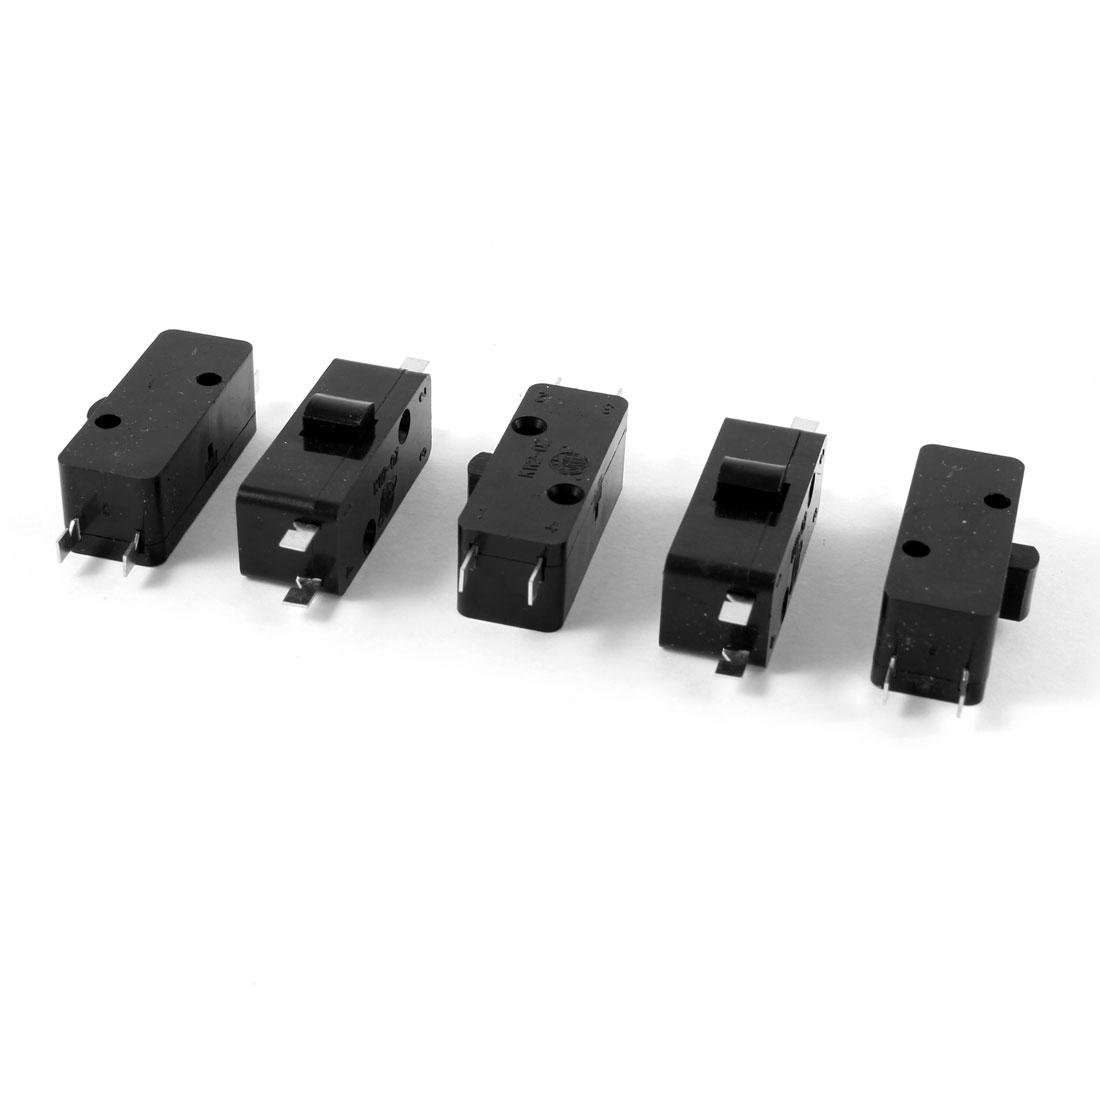 5 Pcs AC 250V/3A 125V/5A SPDT 4 Terminals Push Button Mini Micro Switch